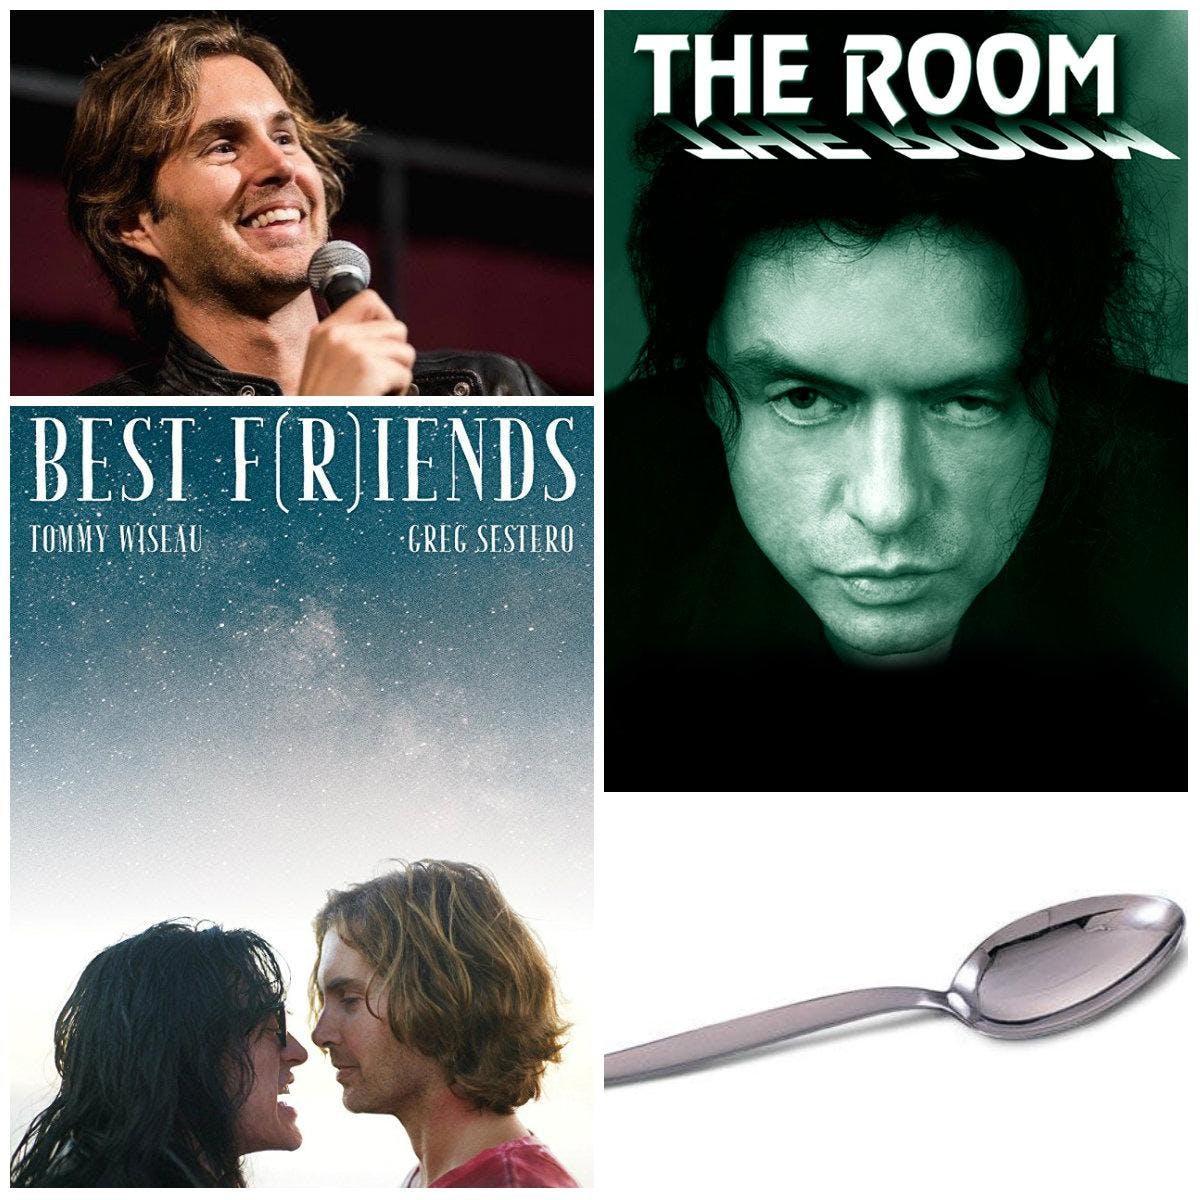 The Room w/ Greg Sestero LIVE at Original Princess Cinema, Waterloo